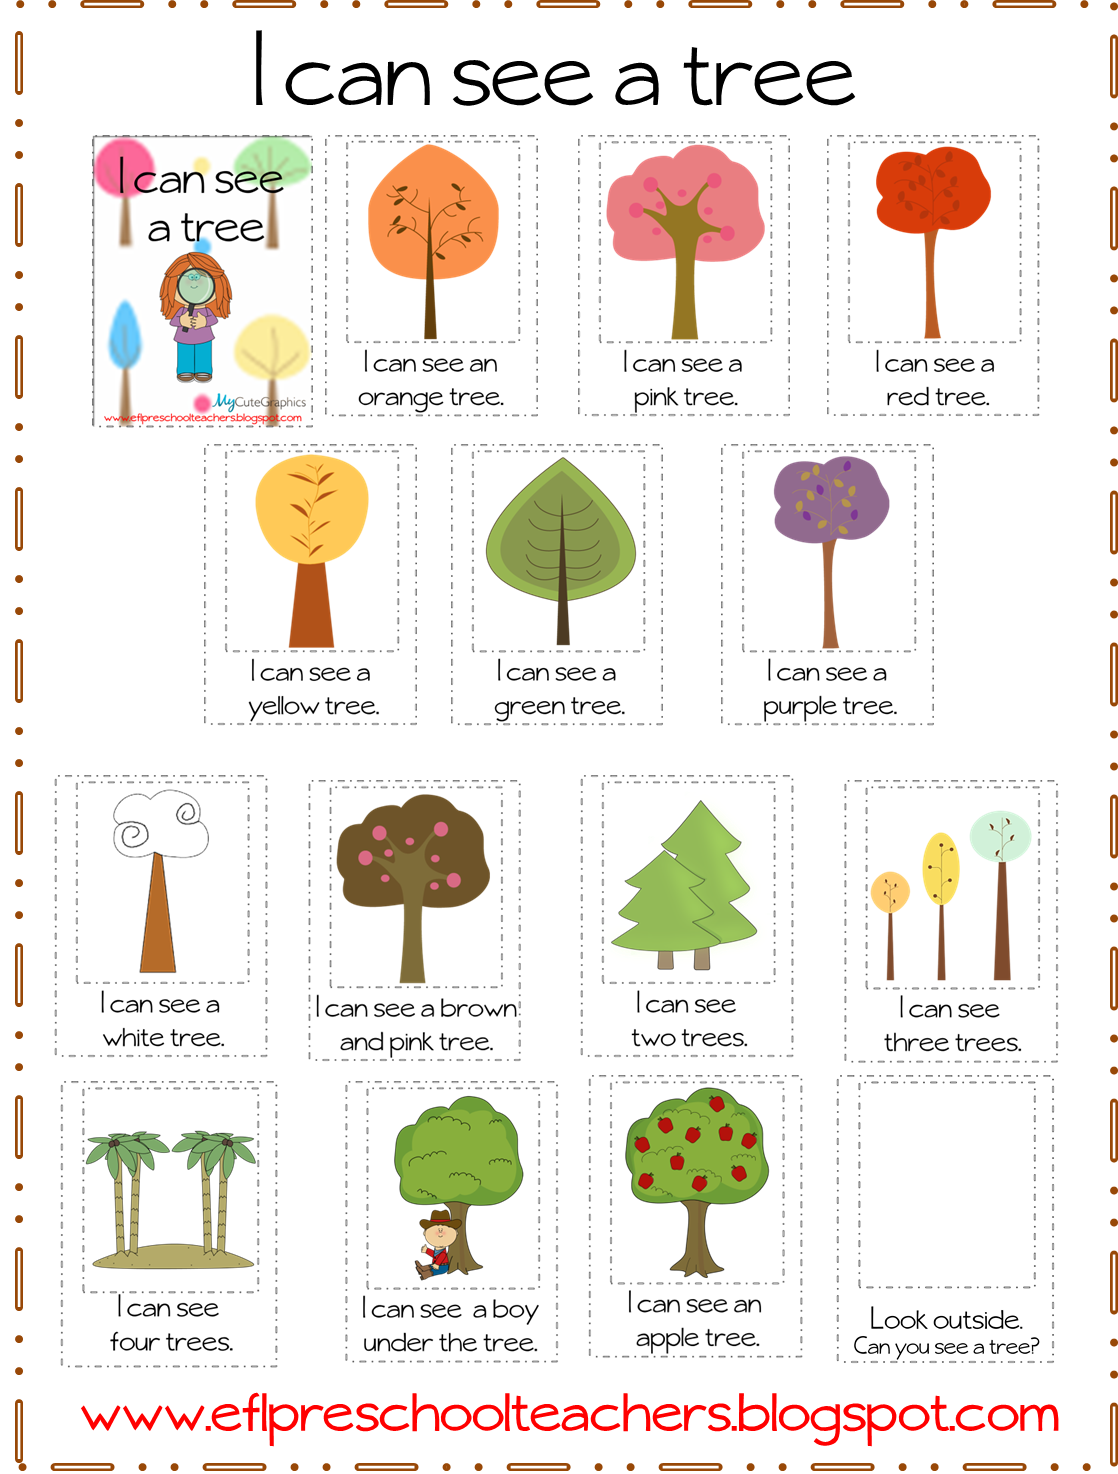 Esl Efl Preschool Teachers Trees